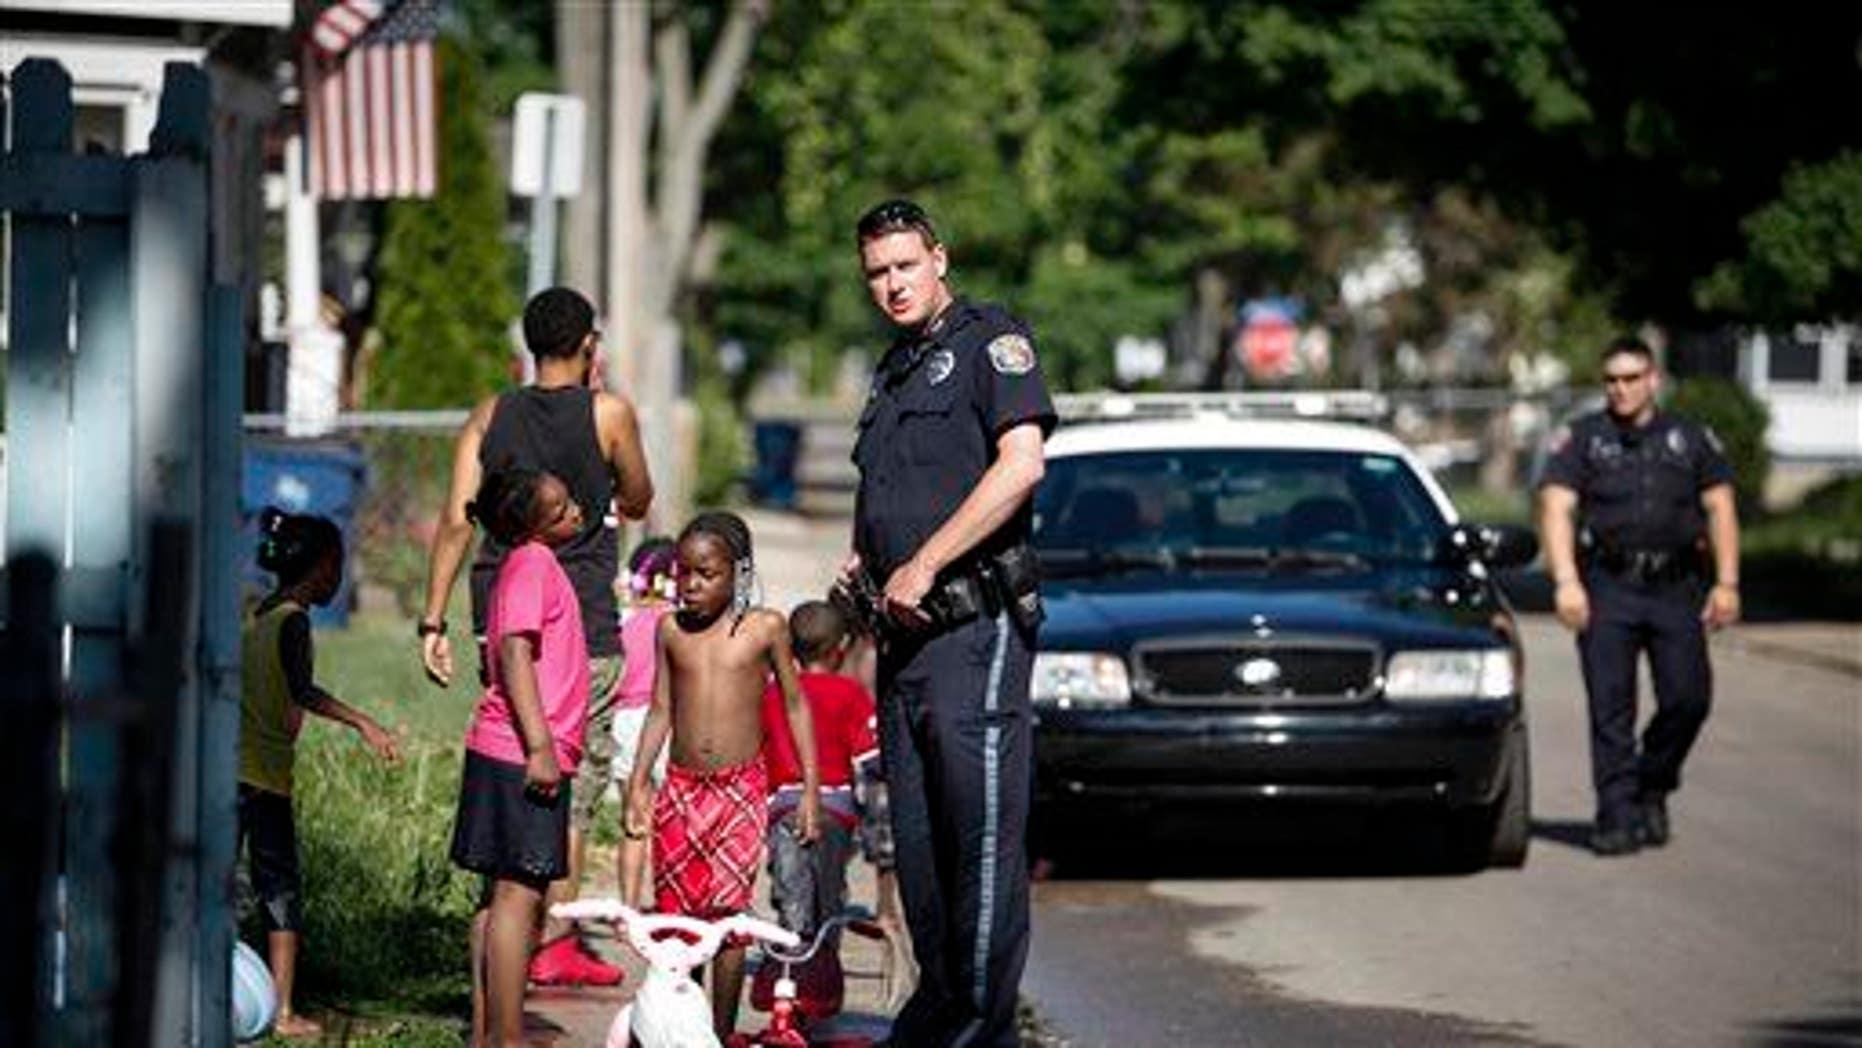 Kalamazoo Public Safety Officer Jason Gates, center, and Officer Joe Hutson, far right, stop on Hays Park Avenue in the Edison neighborhood, Friday, June 6, 2014 in Kalamazoo, Mich.